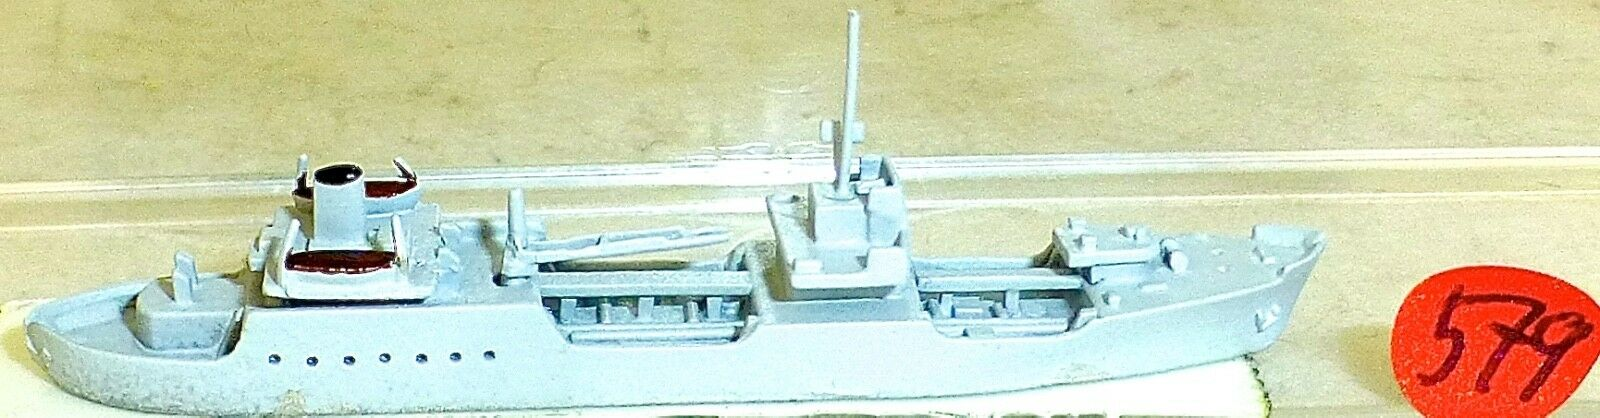 Poel Flottentanker Rda Hai 328 Modèle de Bateau 1 1250 SHP579 Å